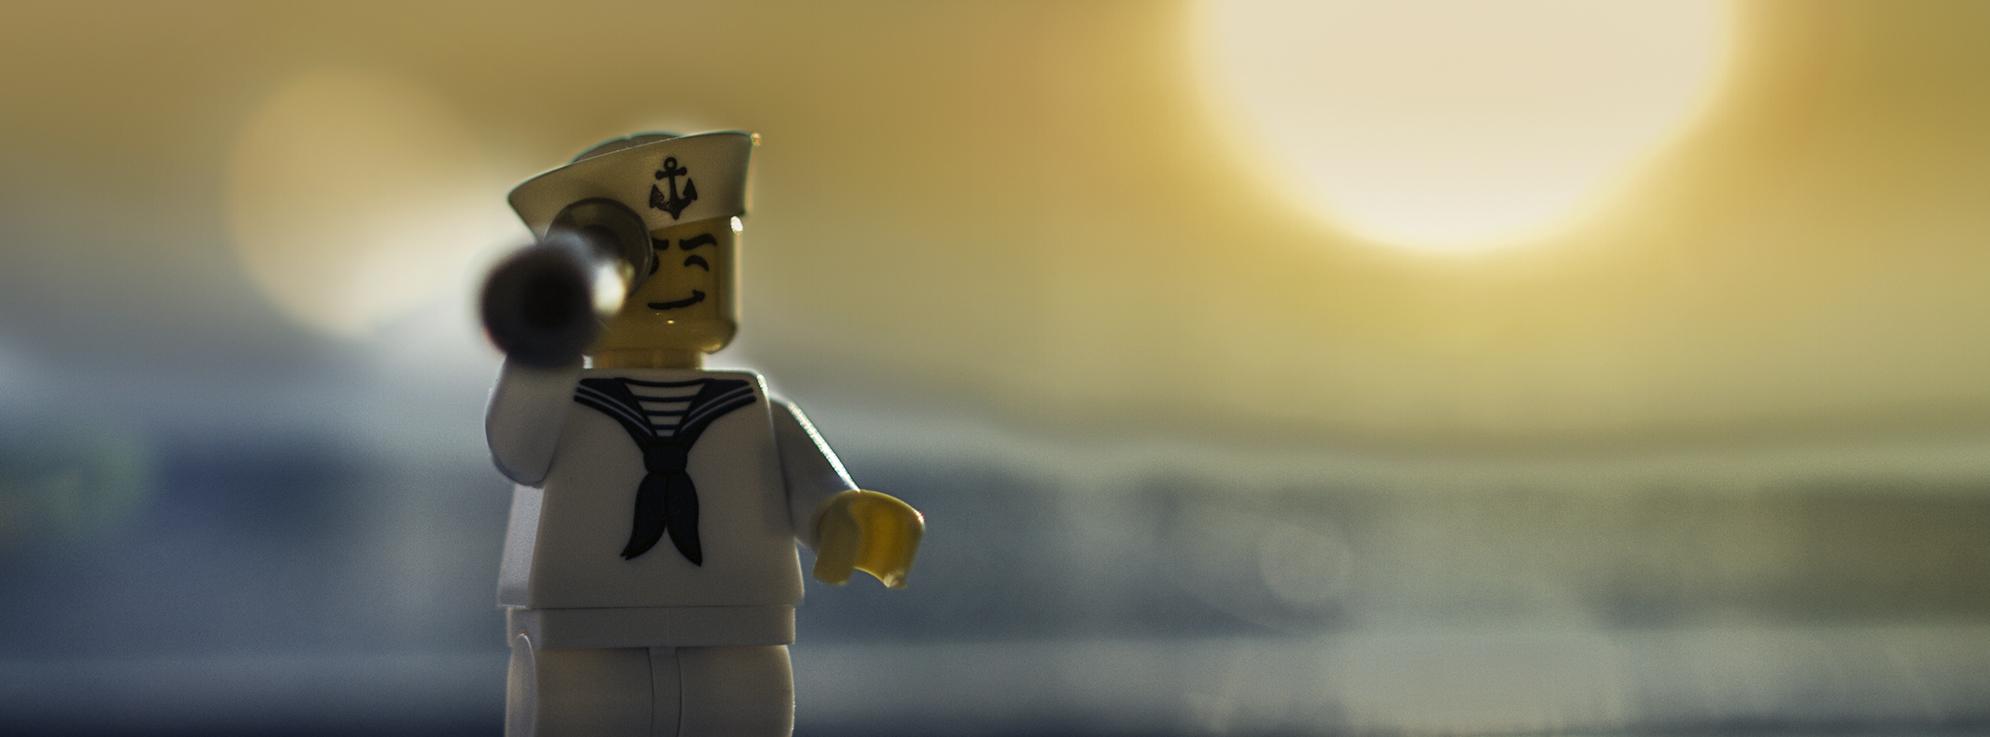 Lego Microgame - tutorial build for WebGL